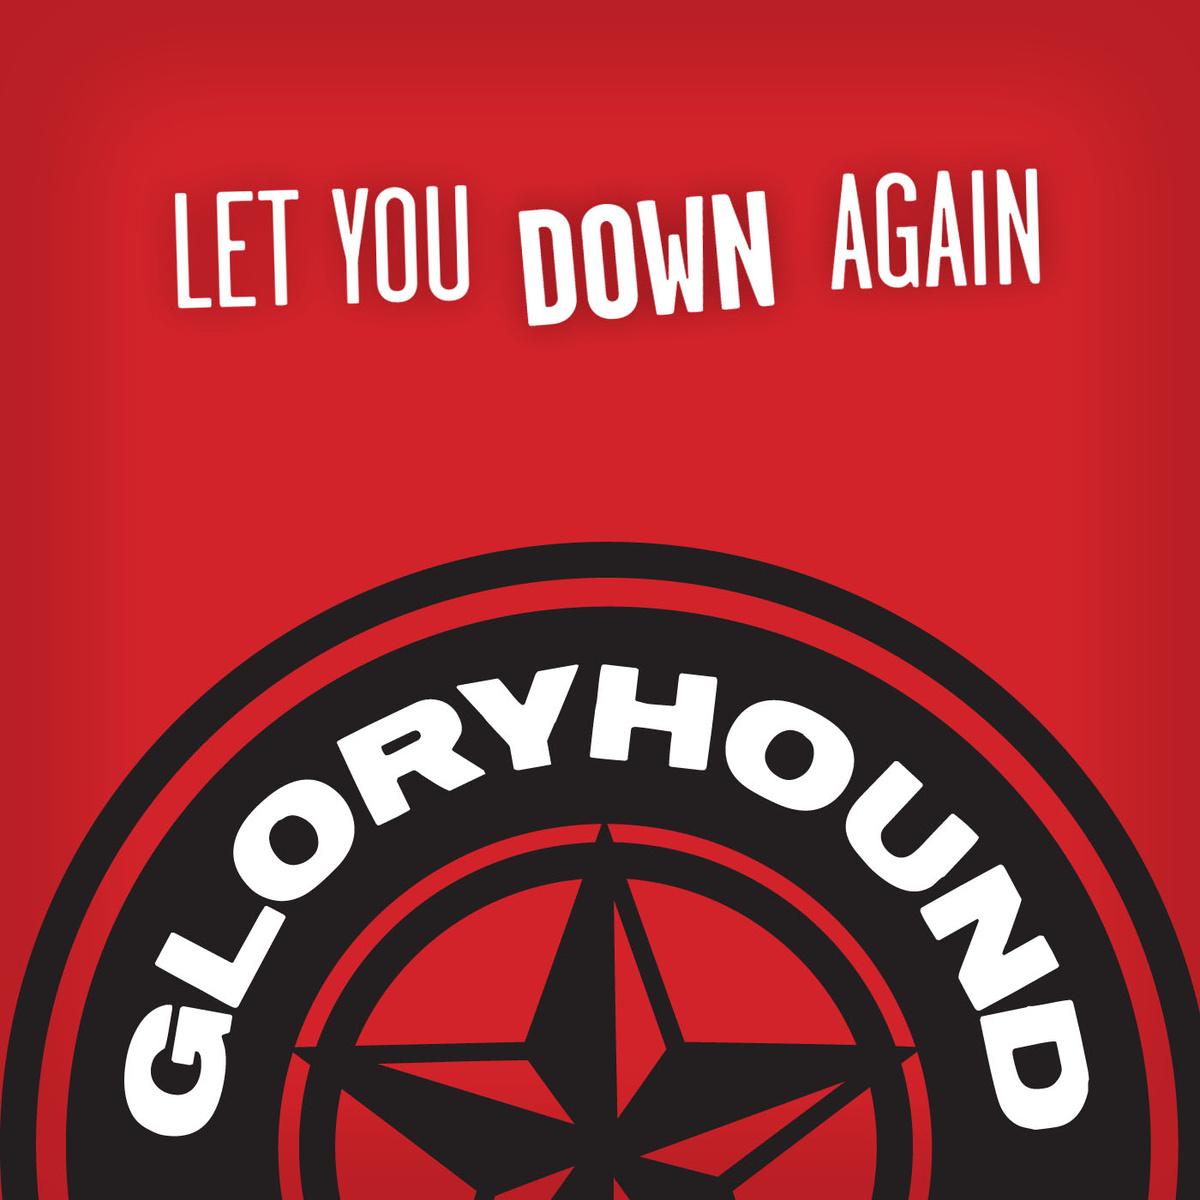 gloryhound_letyoudownagain.jpg